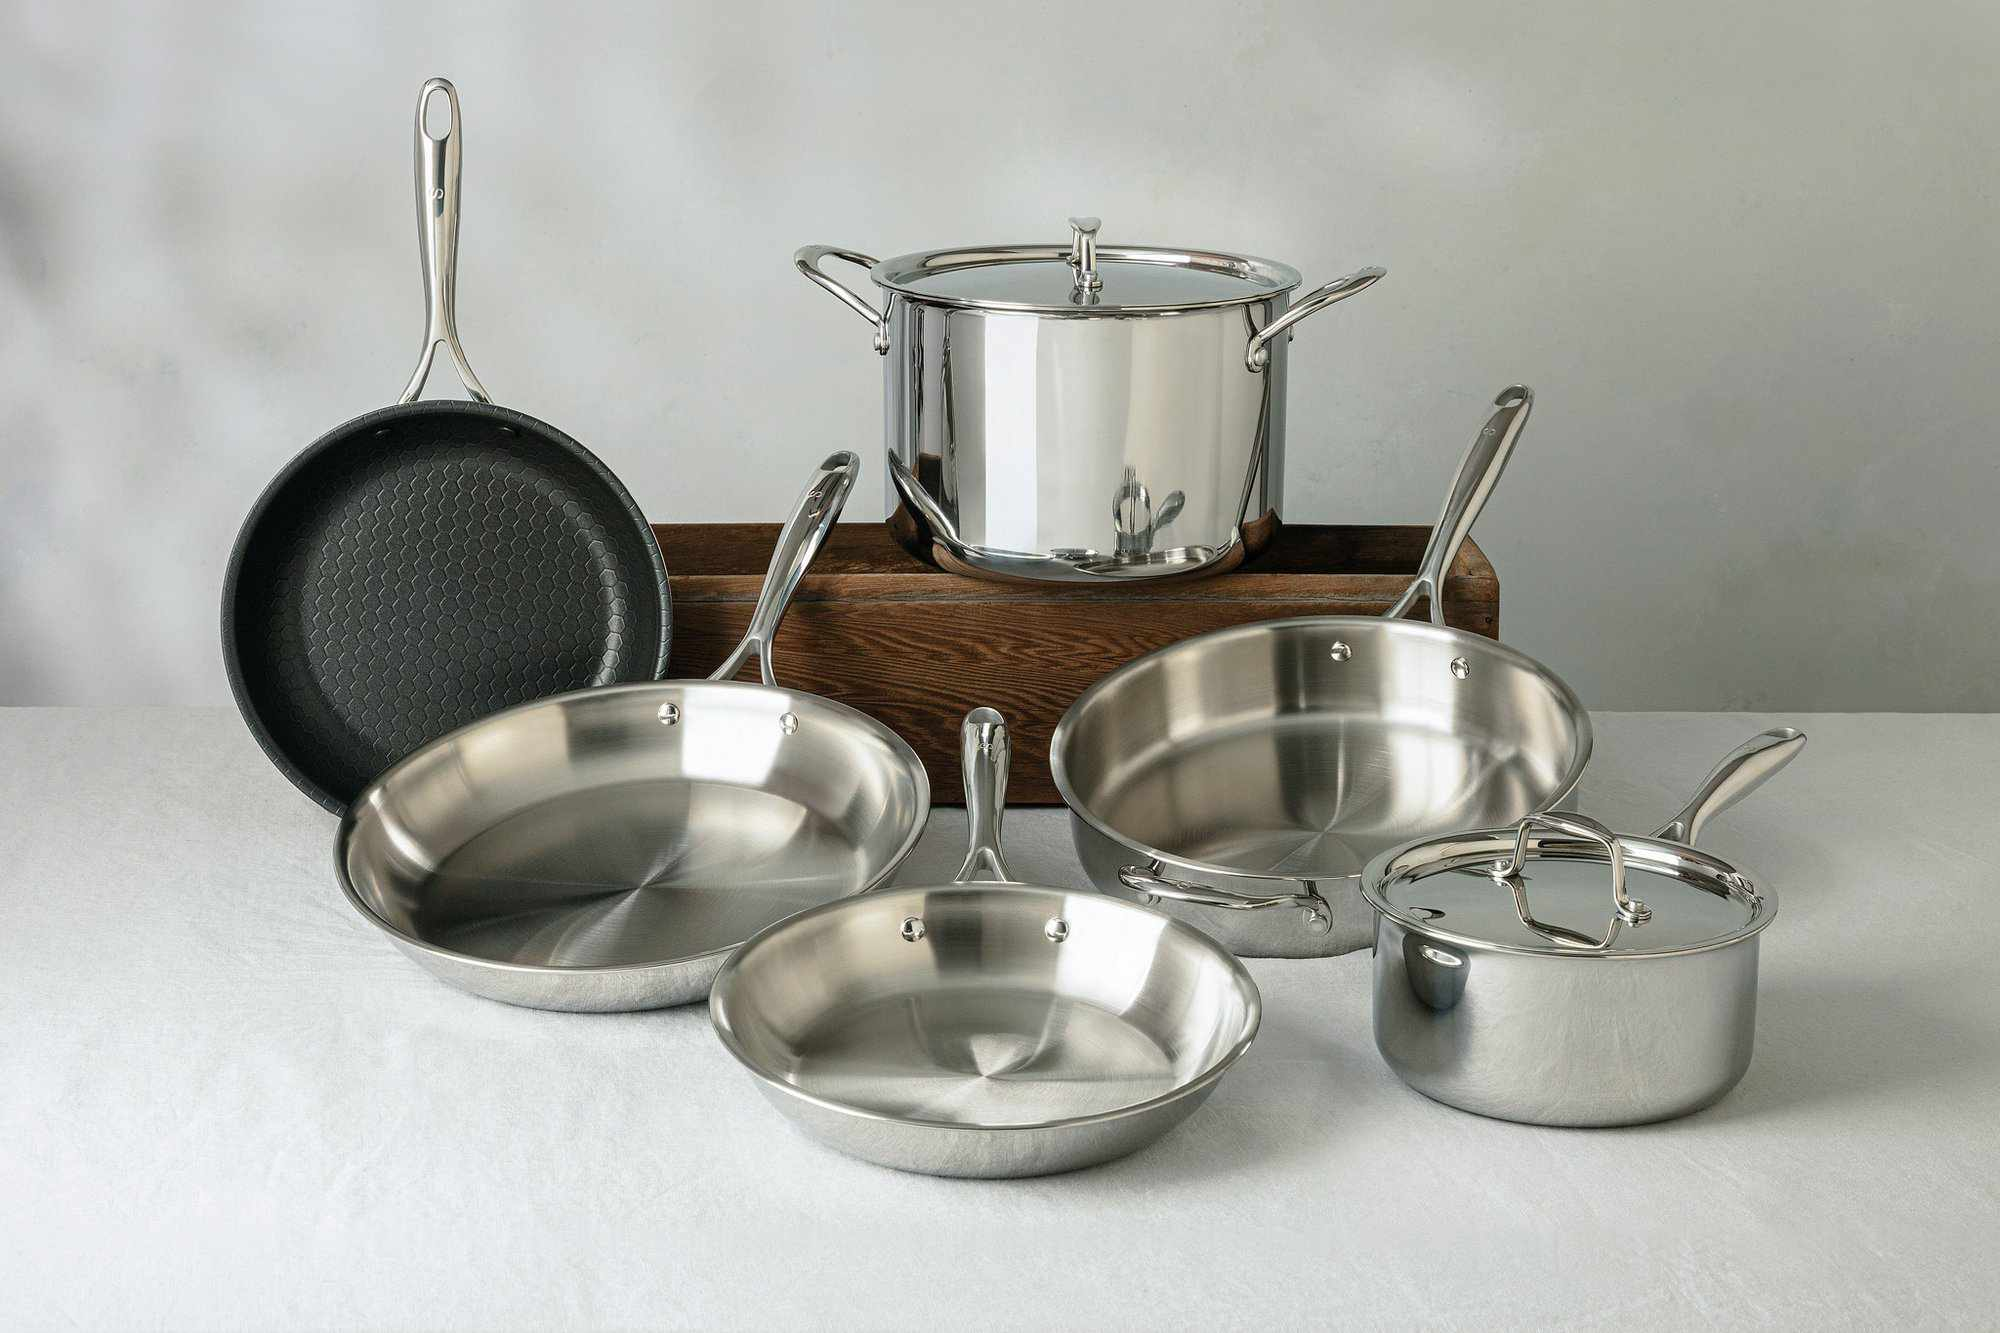 Sardel Full Cookware Set